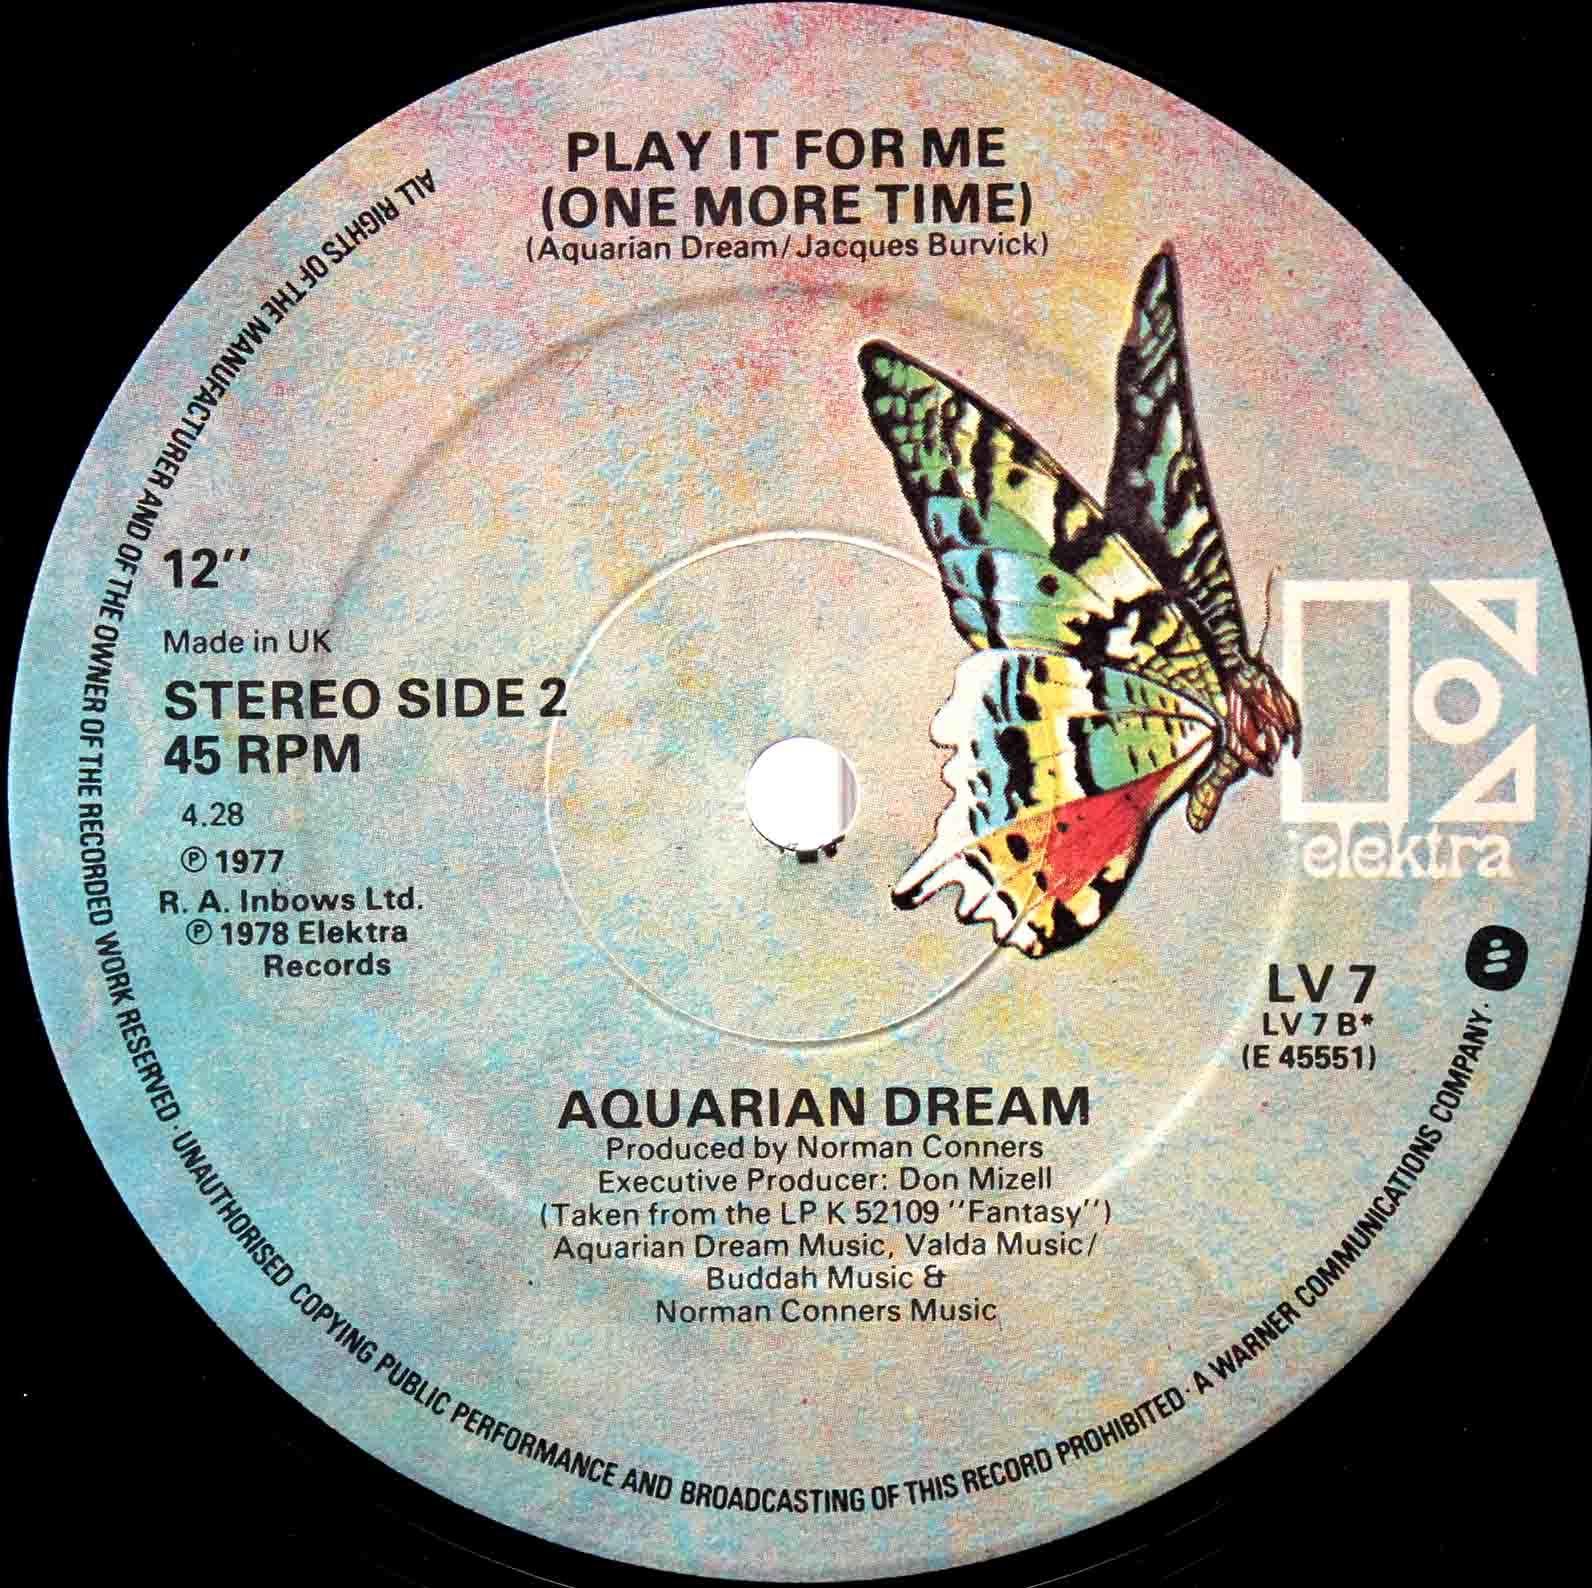 Aquarian Dream – Youre A Star 04